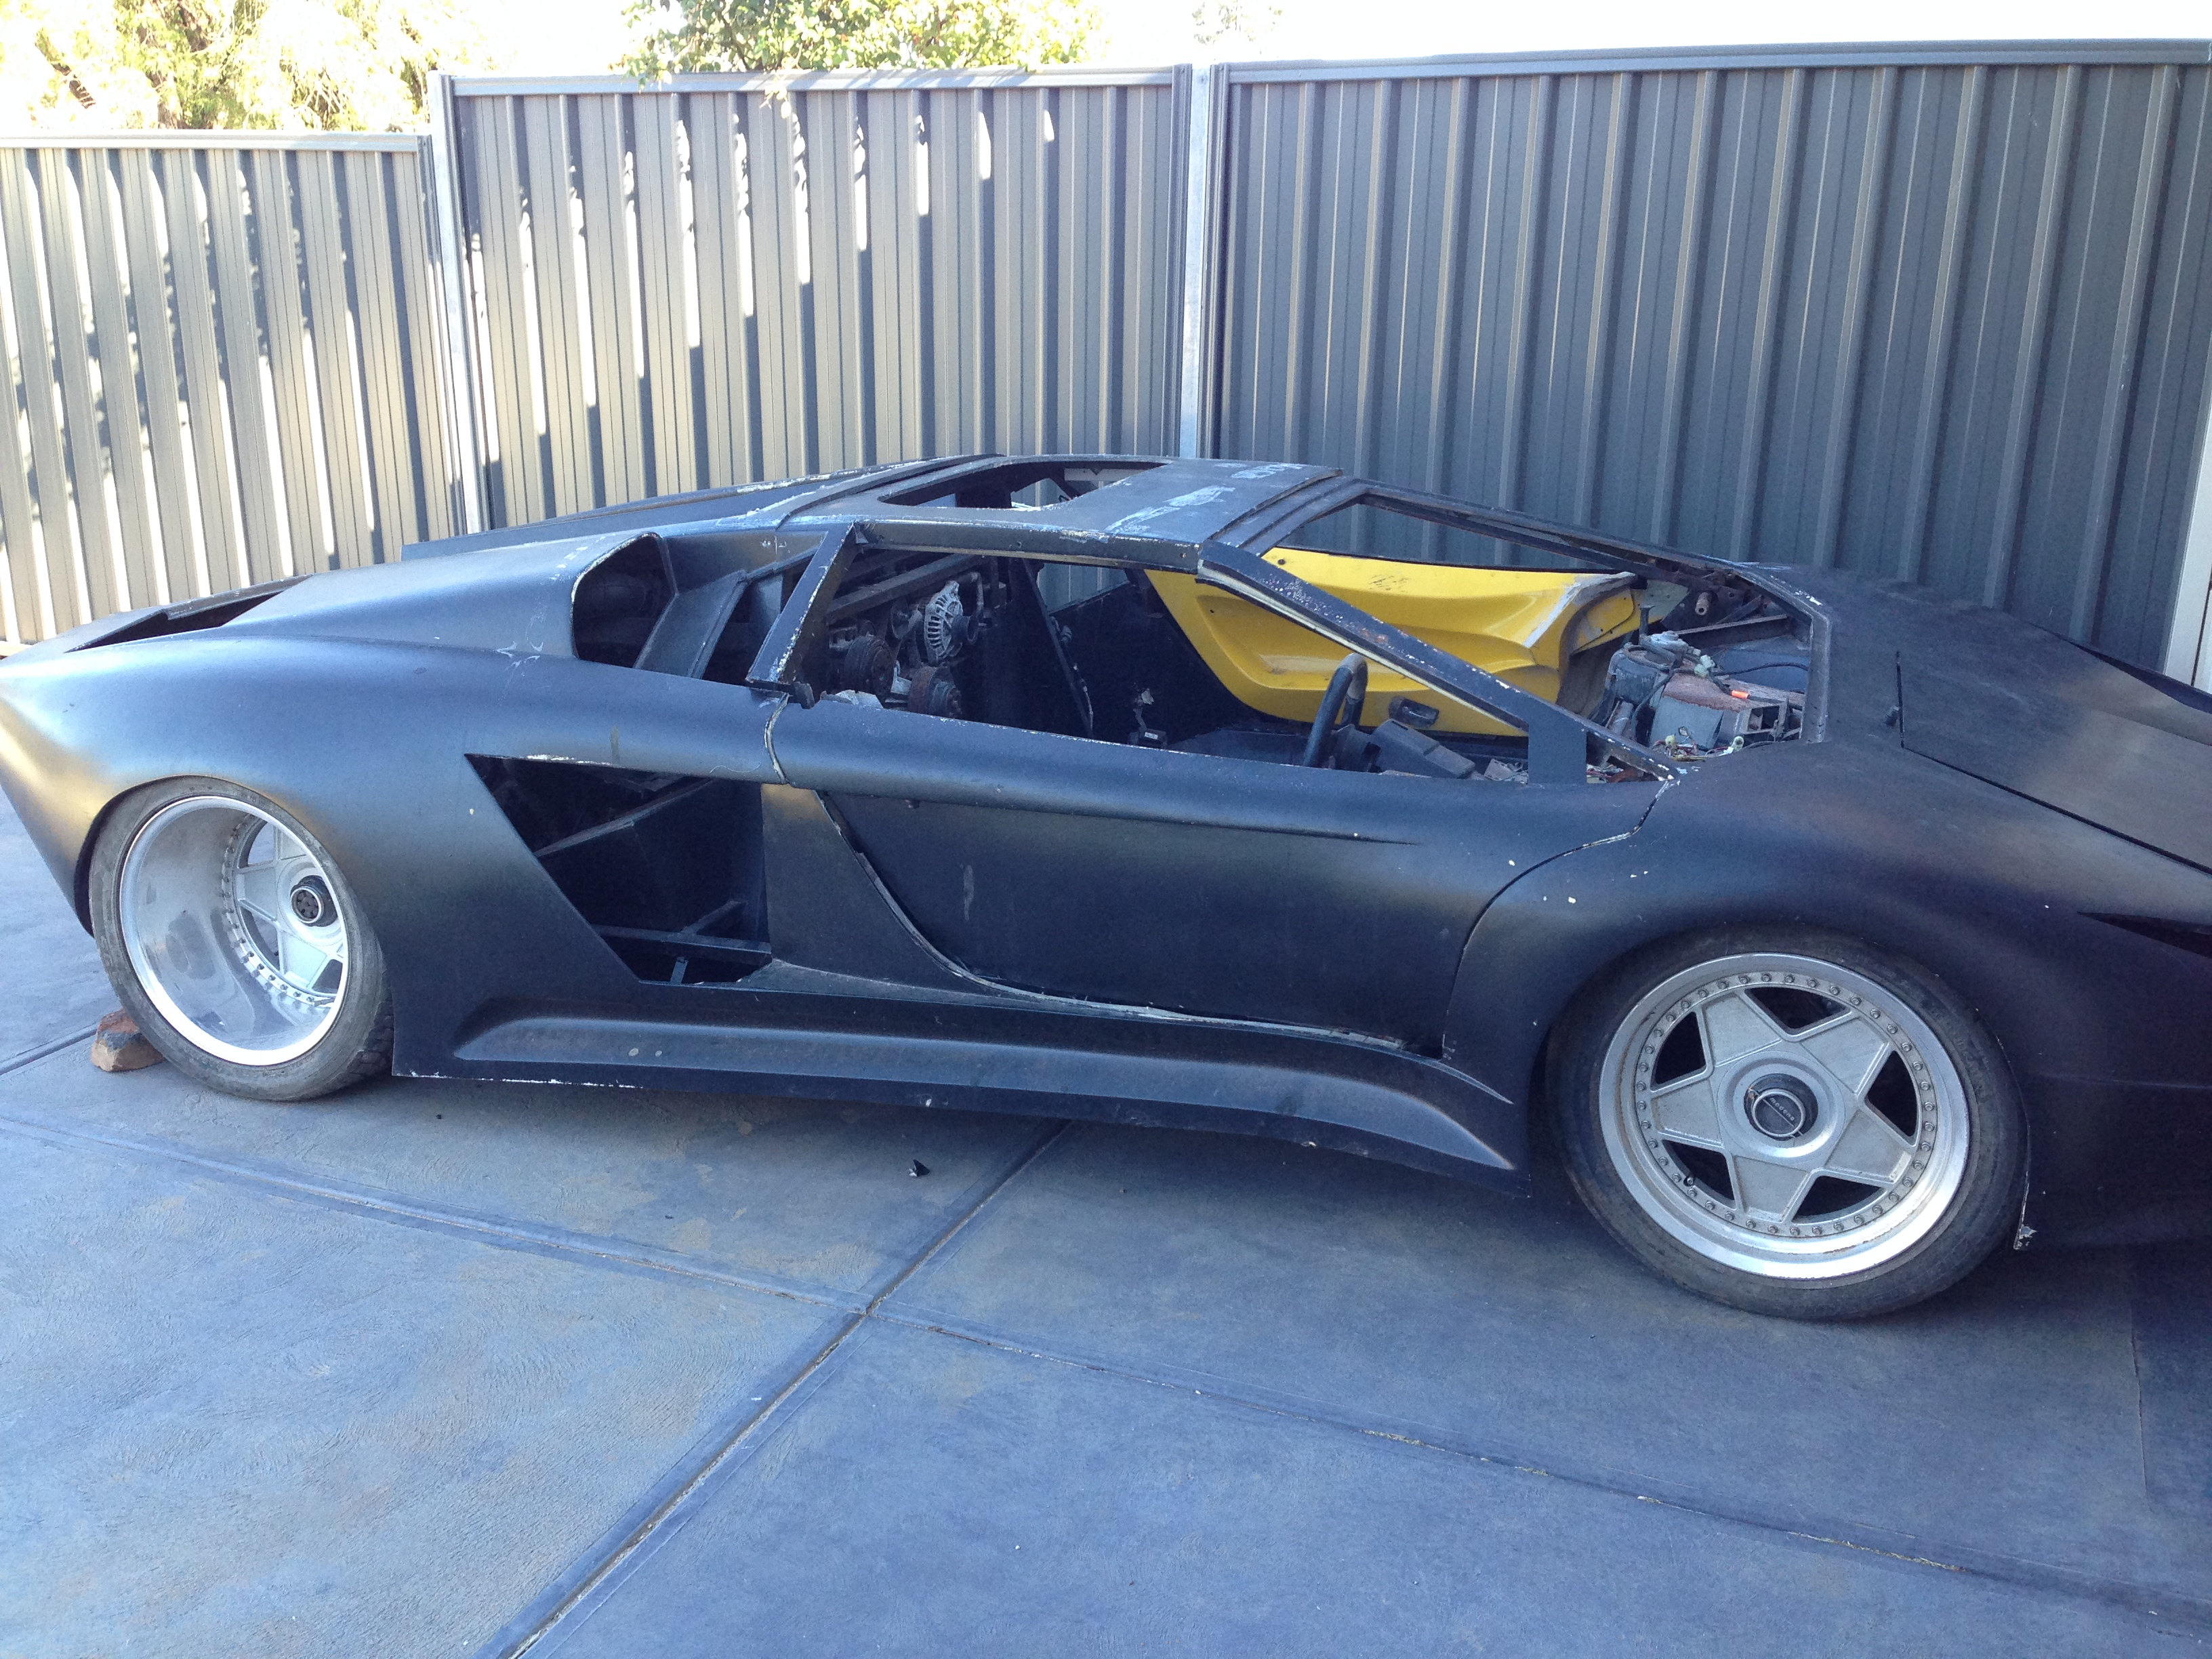 Kit Car Project Arrives Ultimatemancavebuild - Kit car